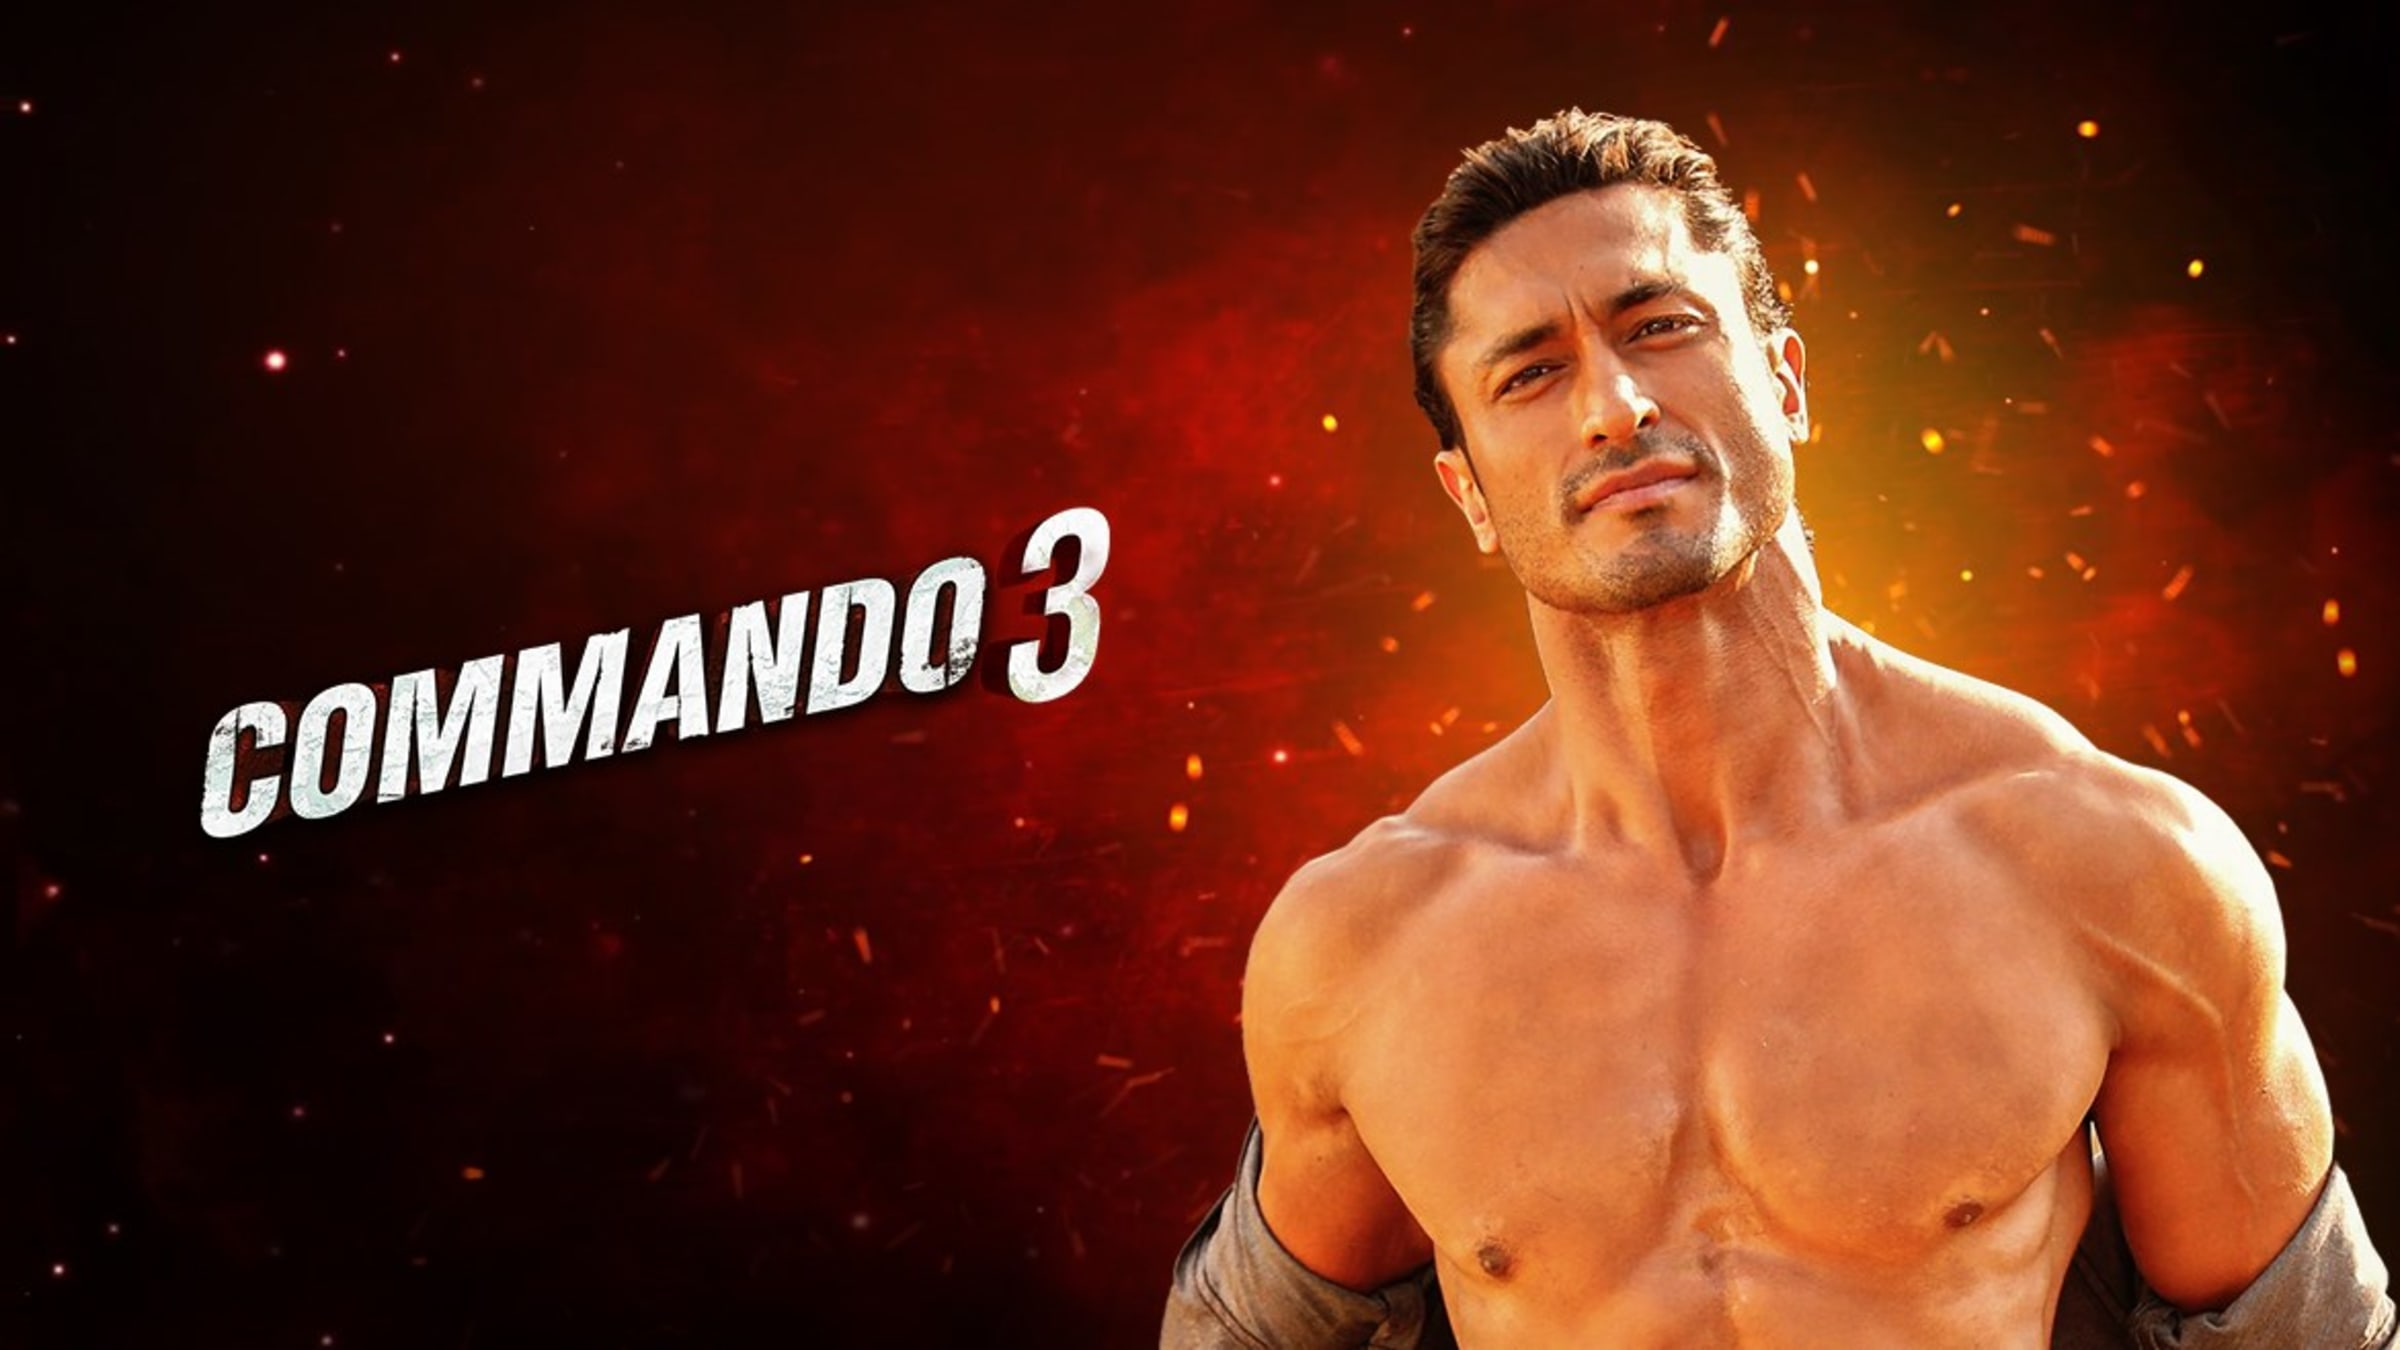 Commando 3 Full Movie 4k